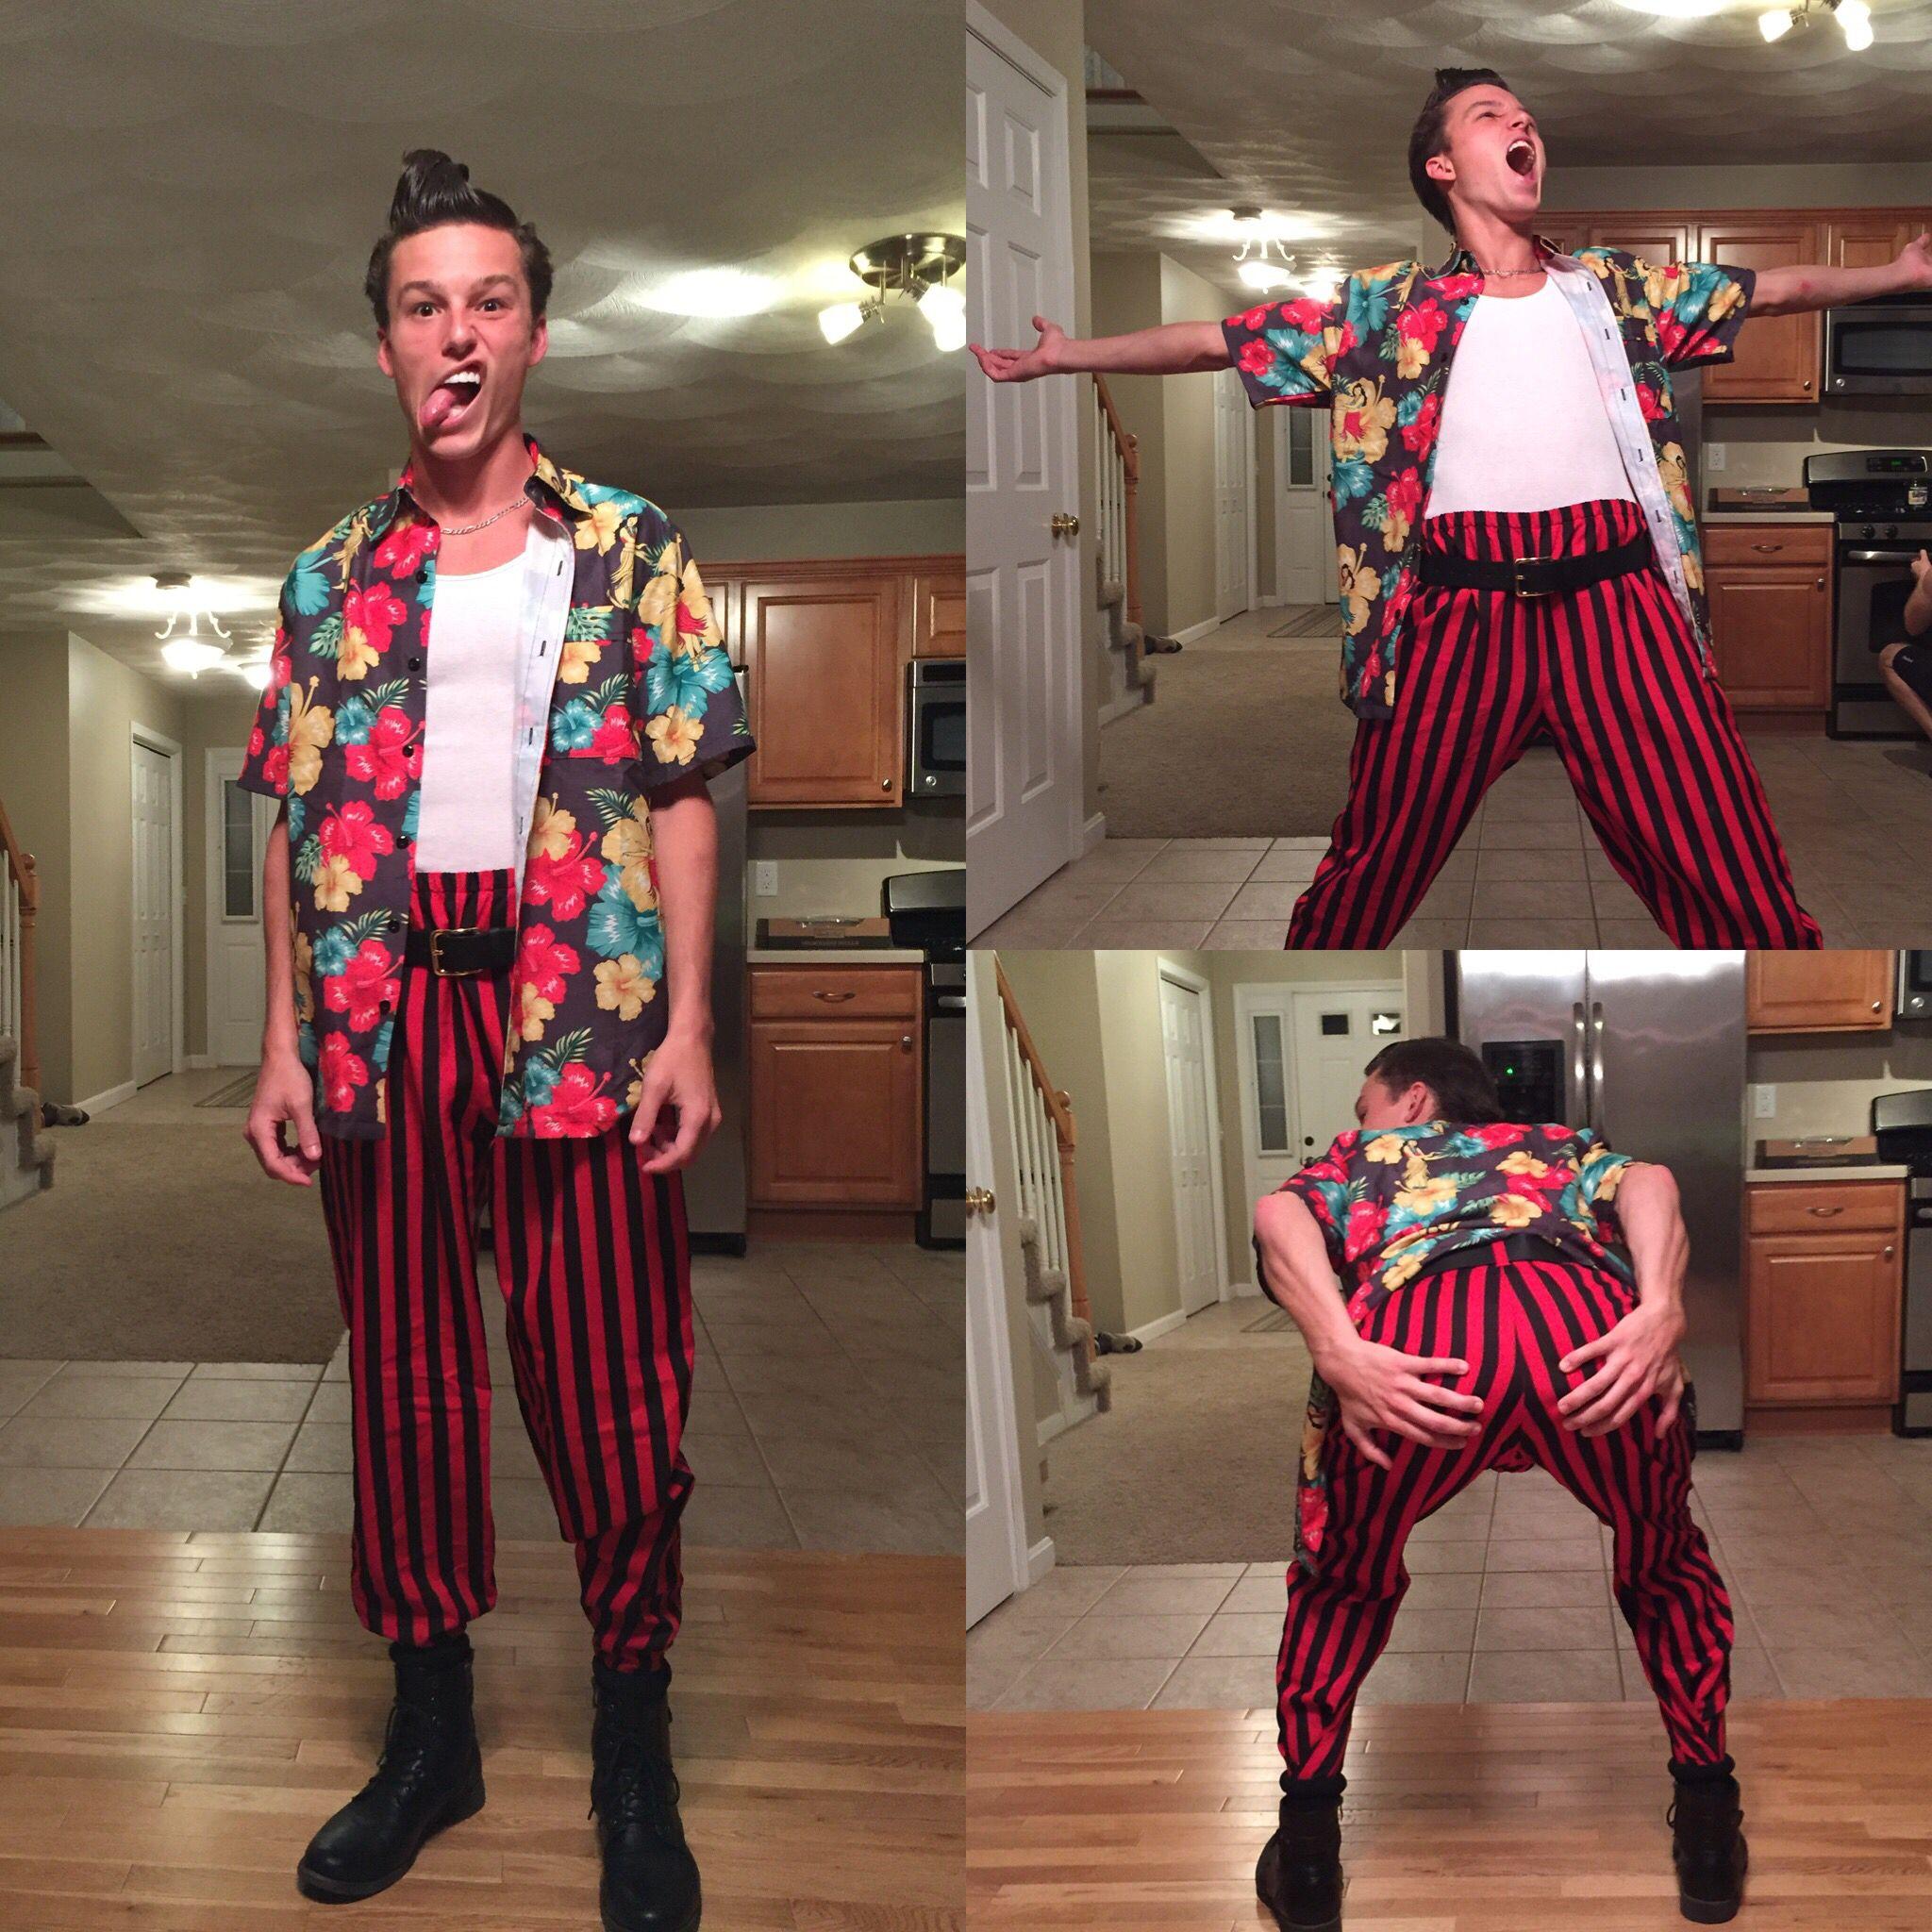 ace ventura halloween 2015halloween costume - Ace Ventura Halloween Costumes